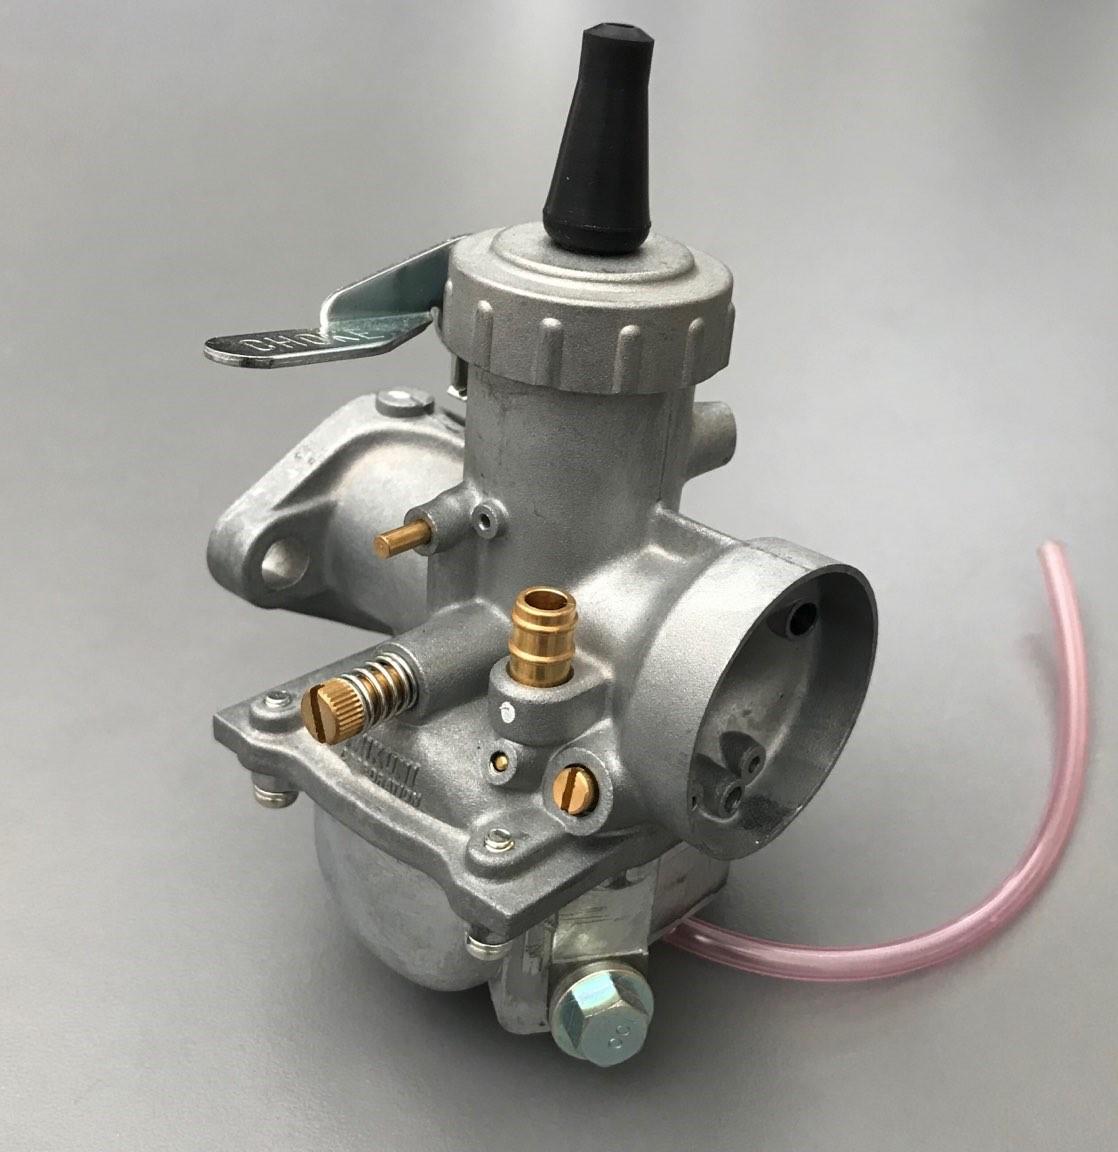 1. VM22-133 22mm Mikuni VM Carburetor | Mikunioz